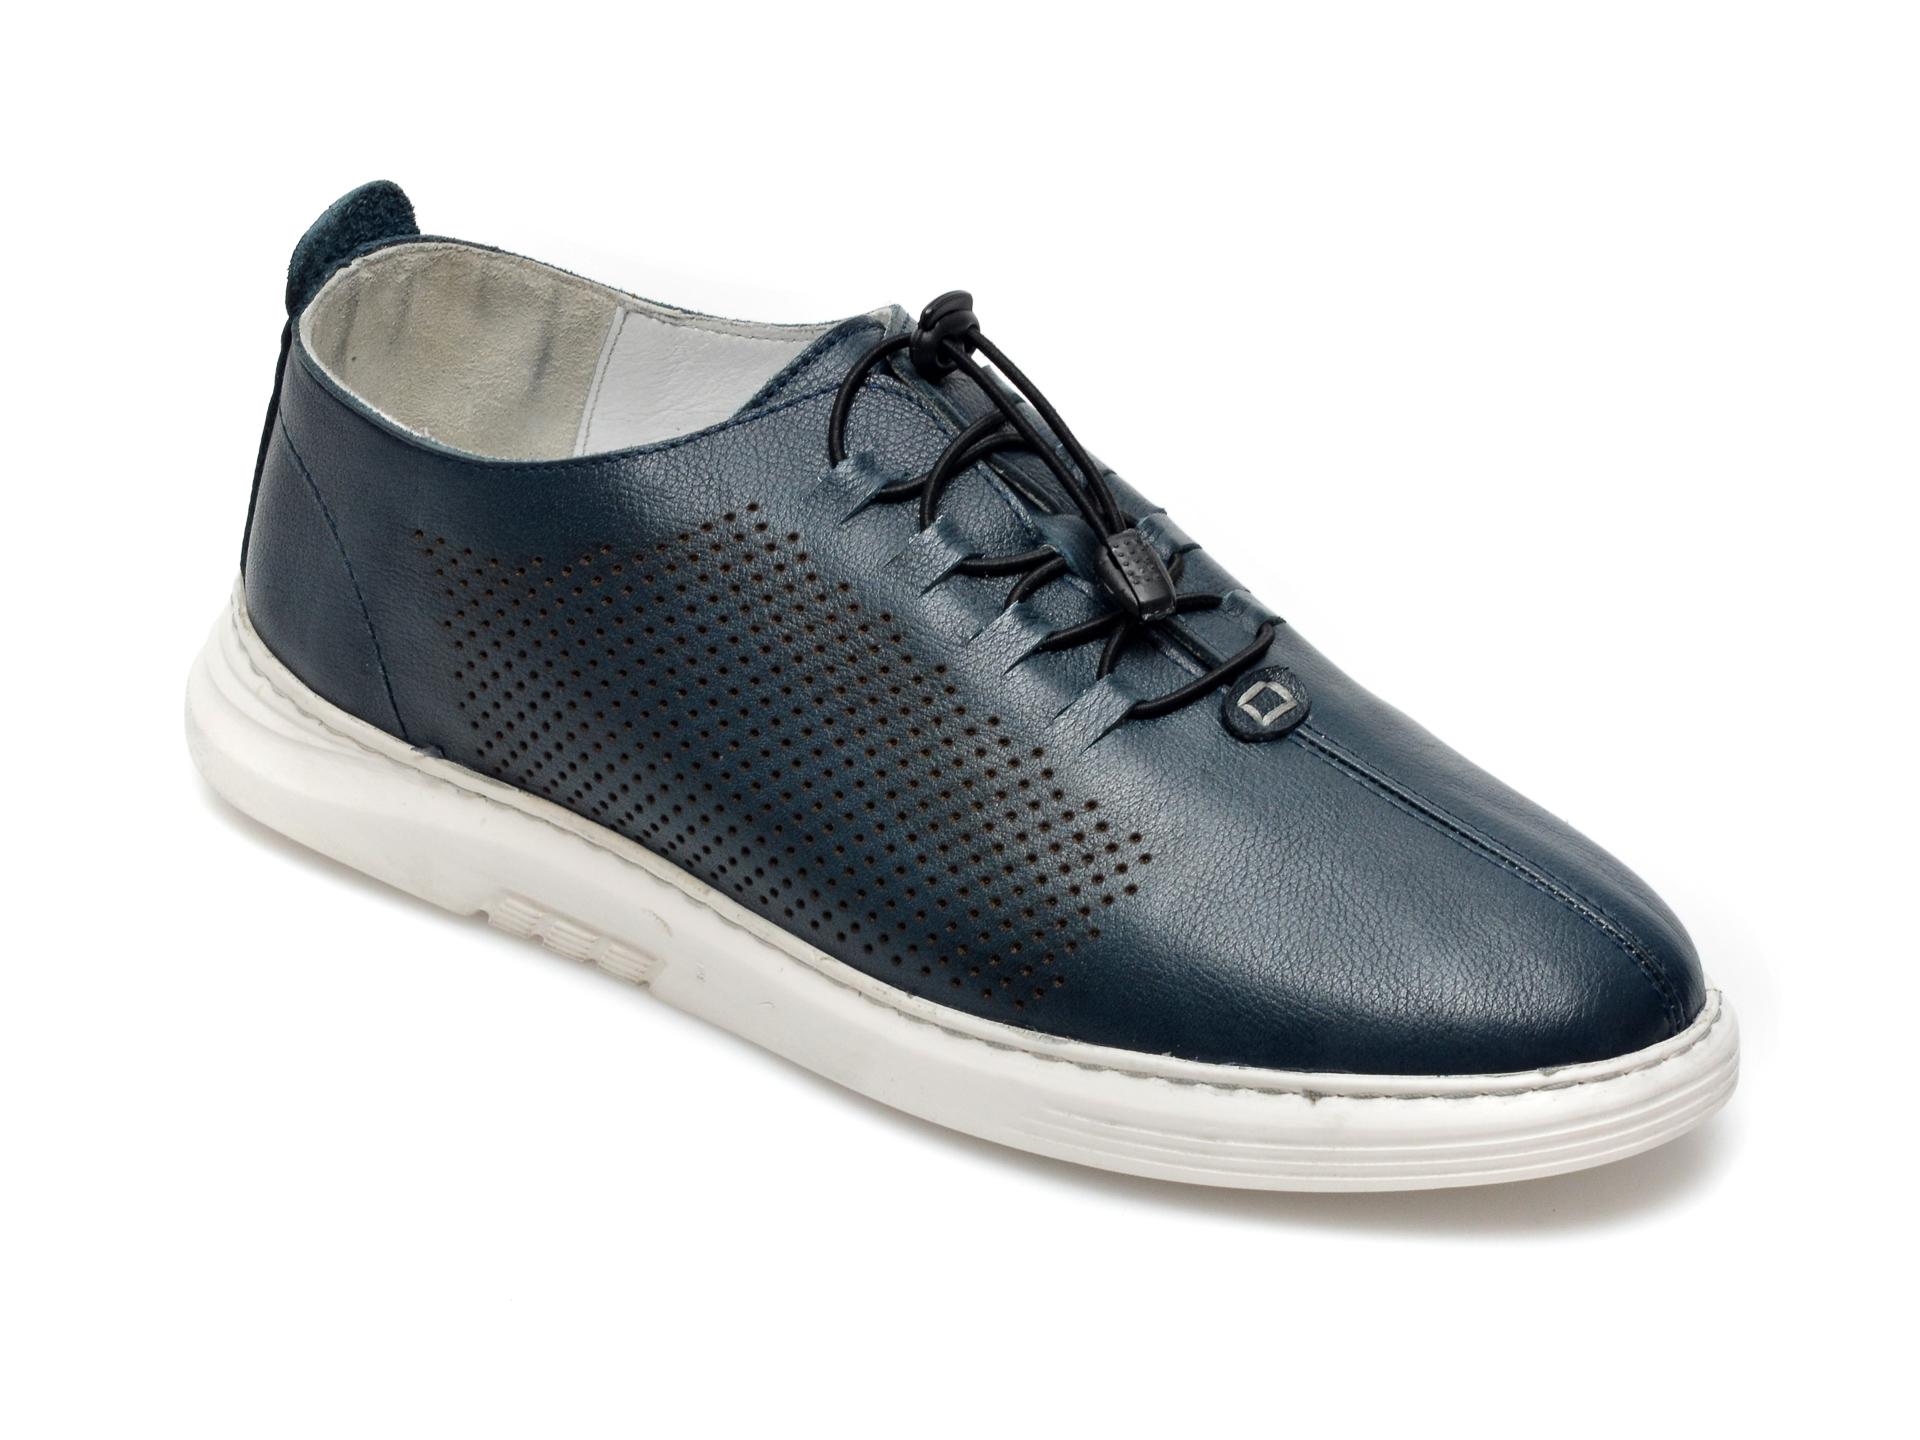 Pantofi OTTER bleumarin, 2025, din piele naturala imagine otter.ro 2021